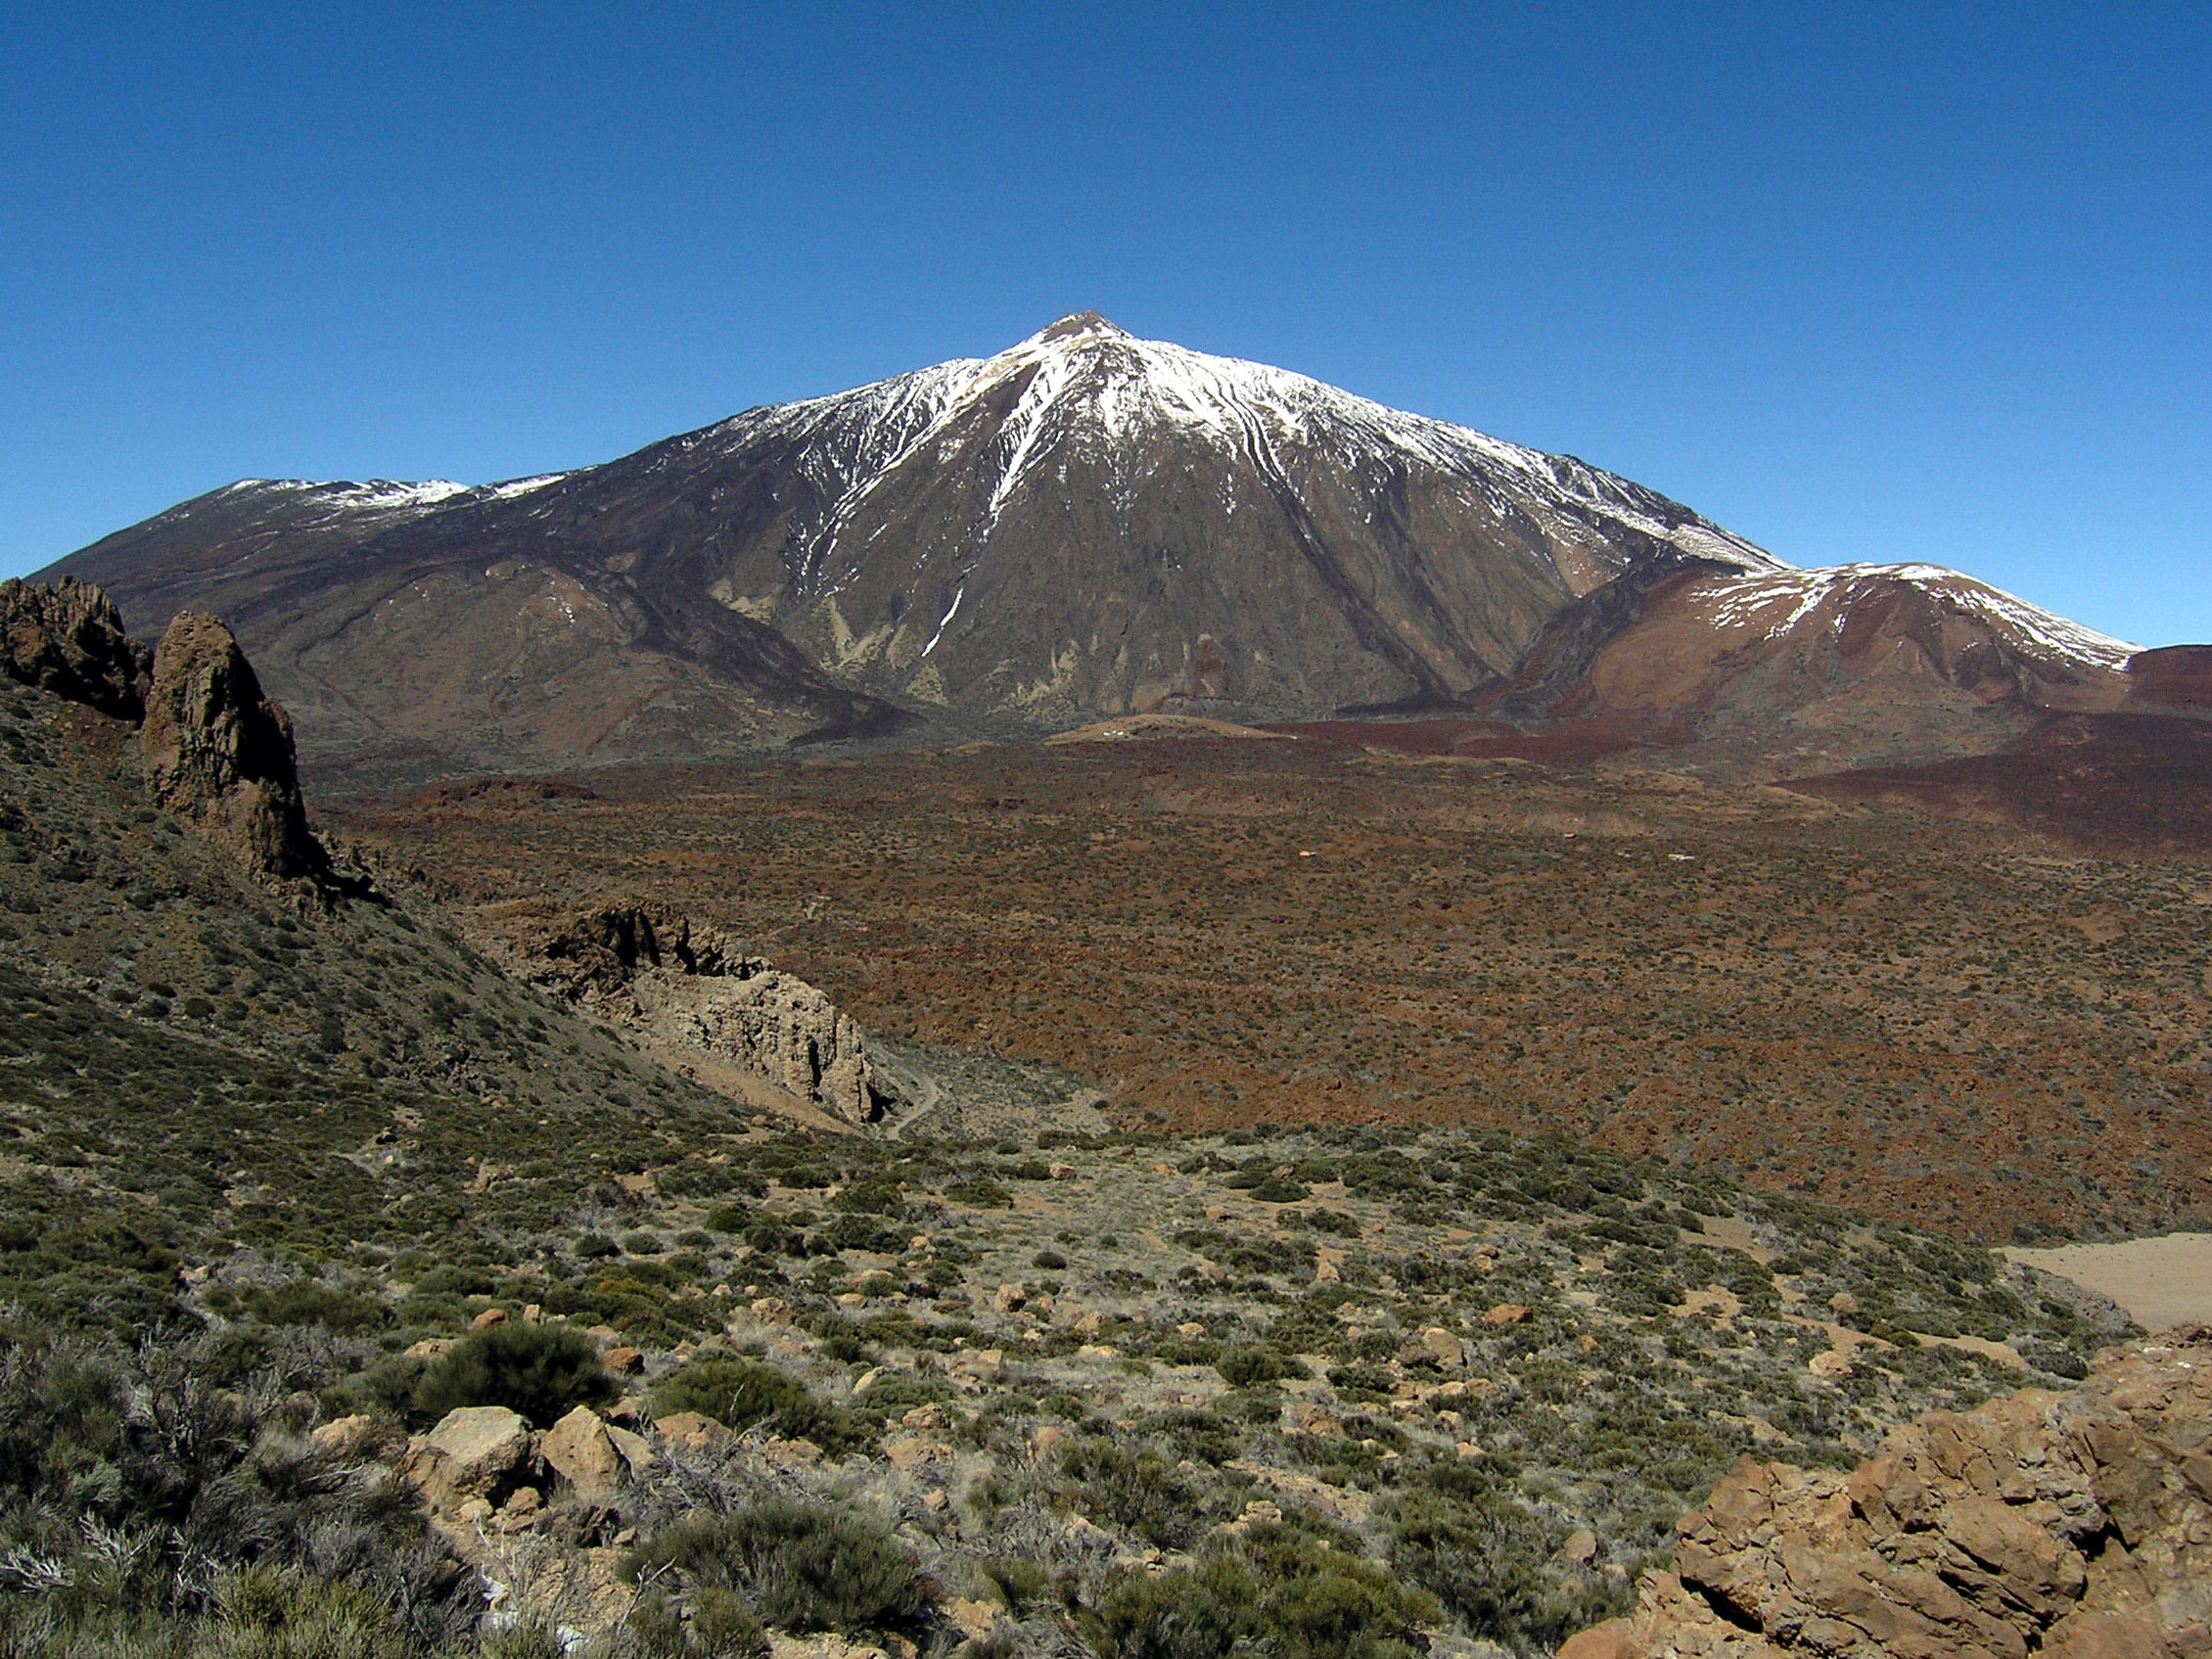 Spania - Teide - 3718 metri